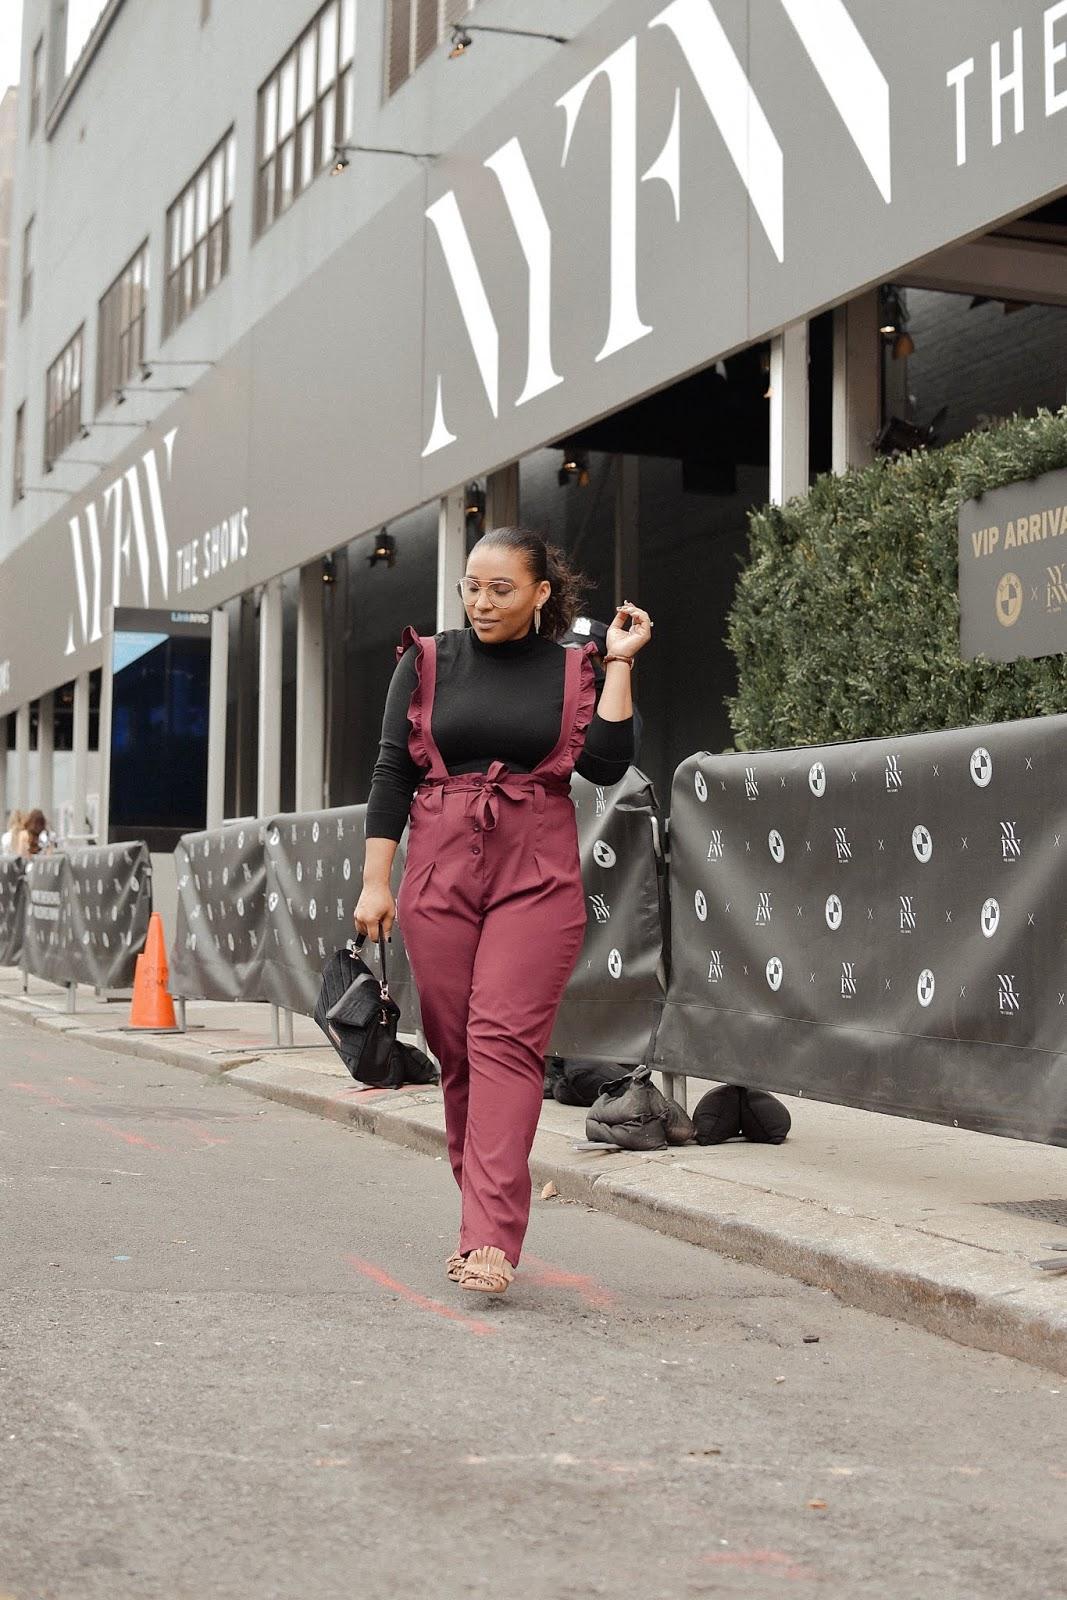 Indonesian Diversity, nyfw, nyfw 2019, fashion blogger, streetstyle, pattys kloset